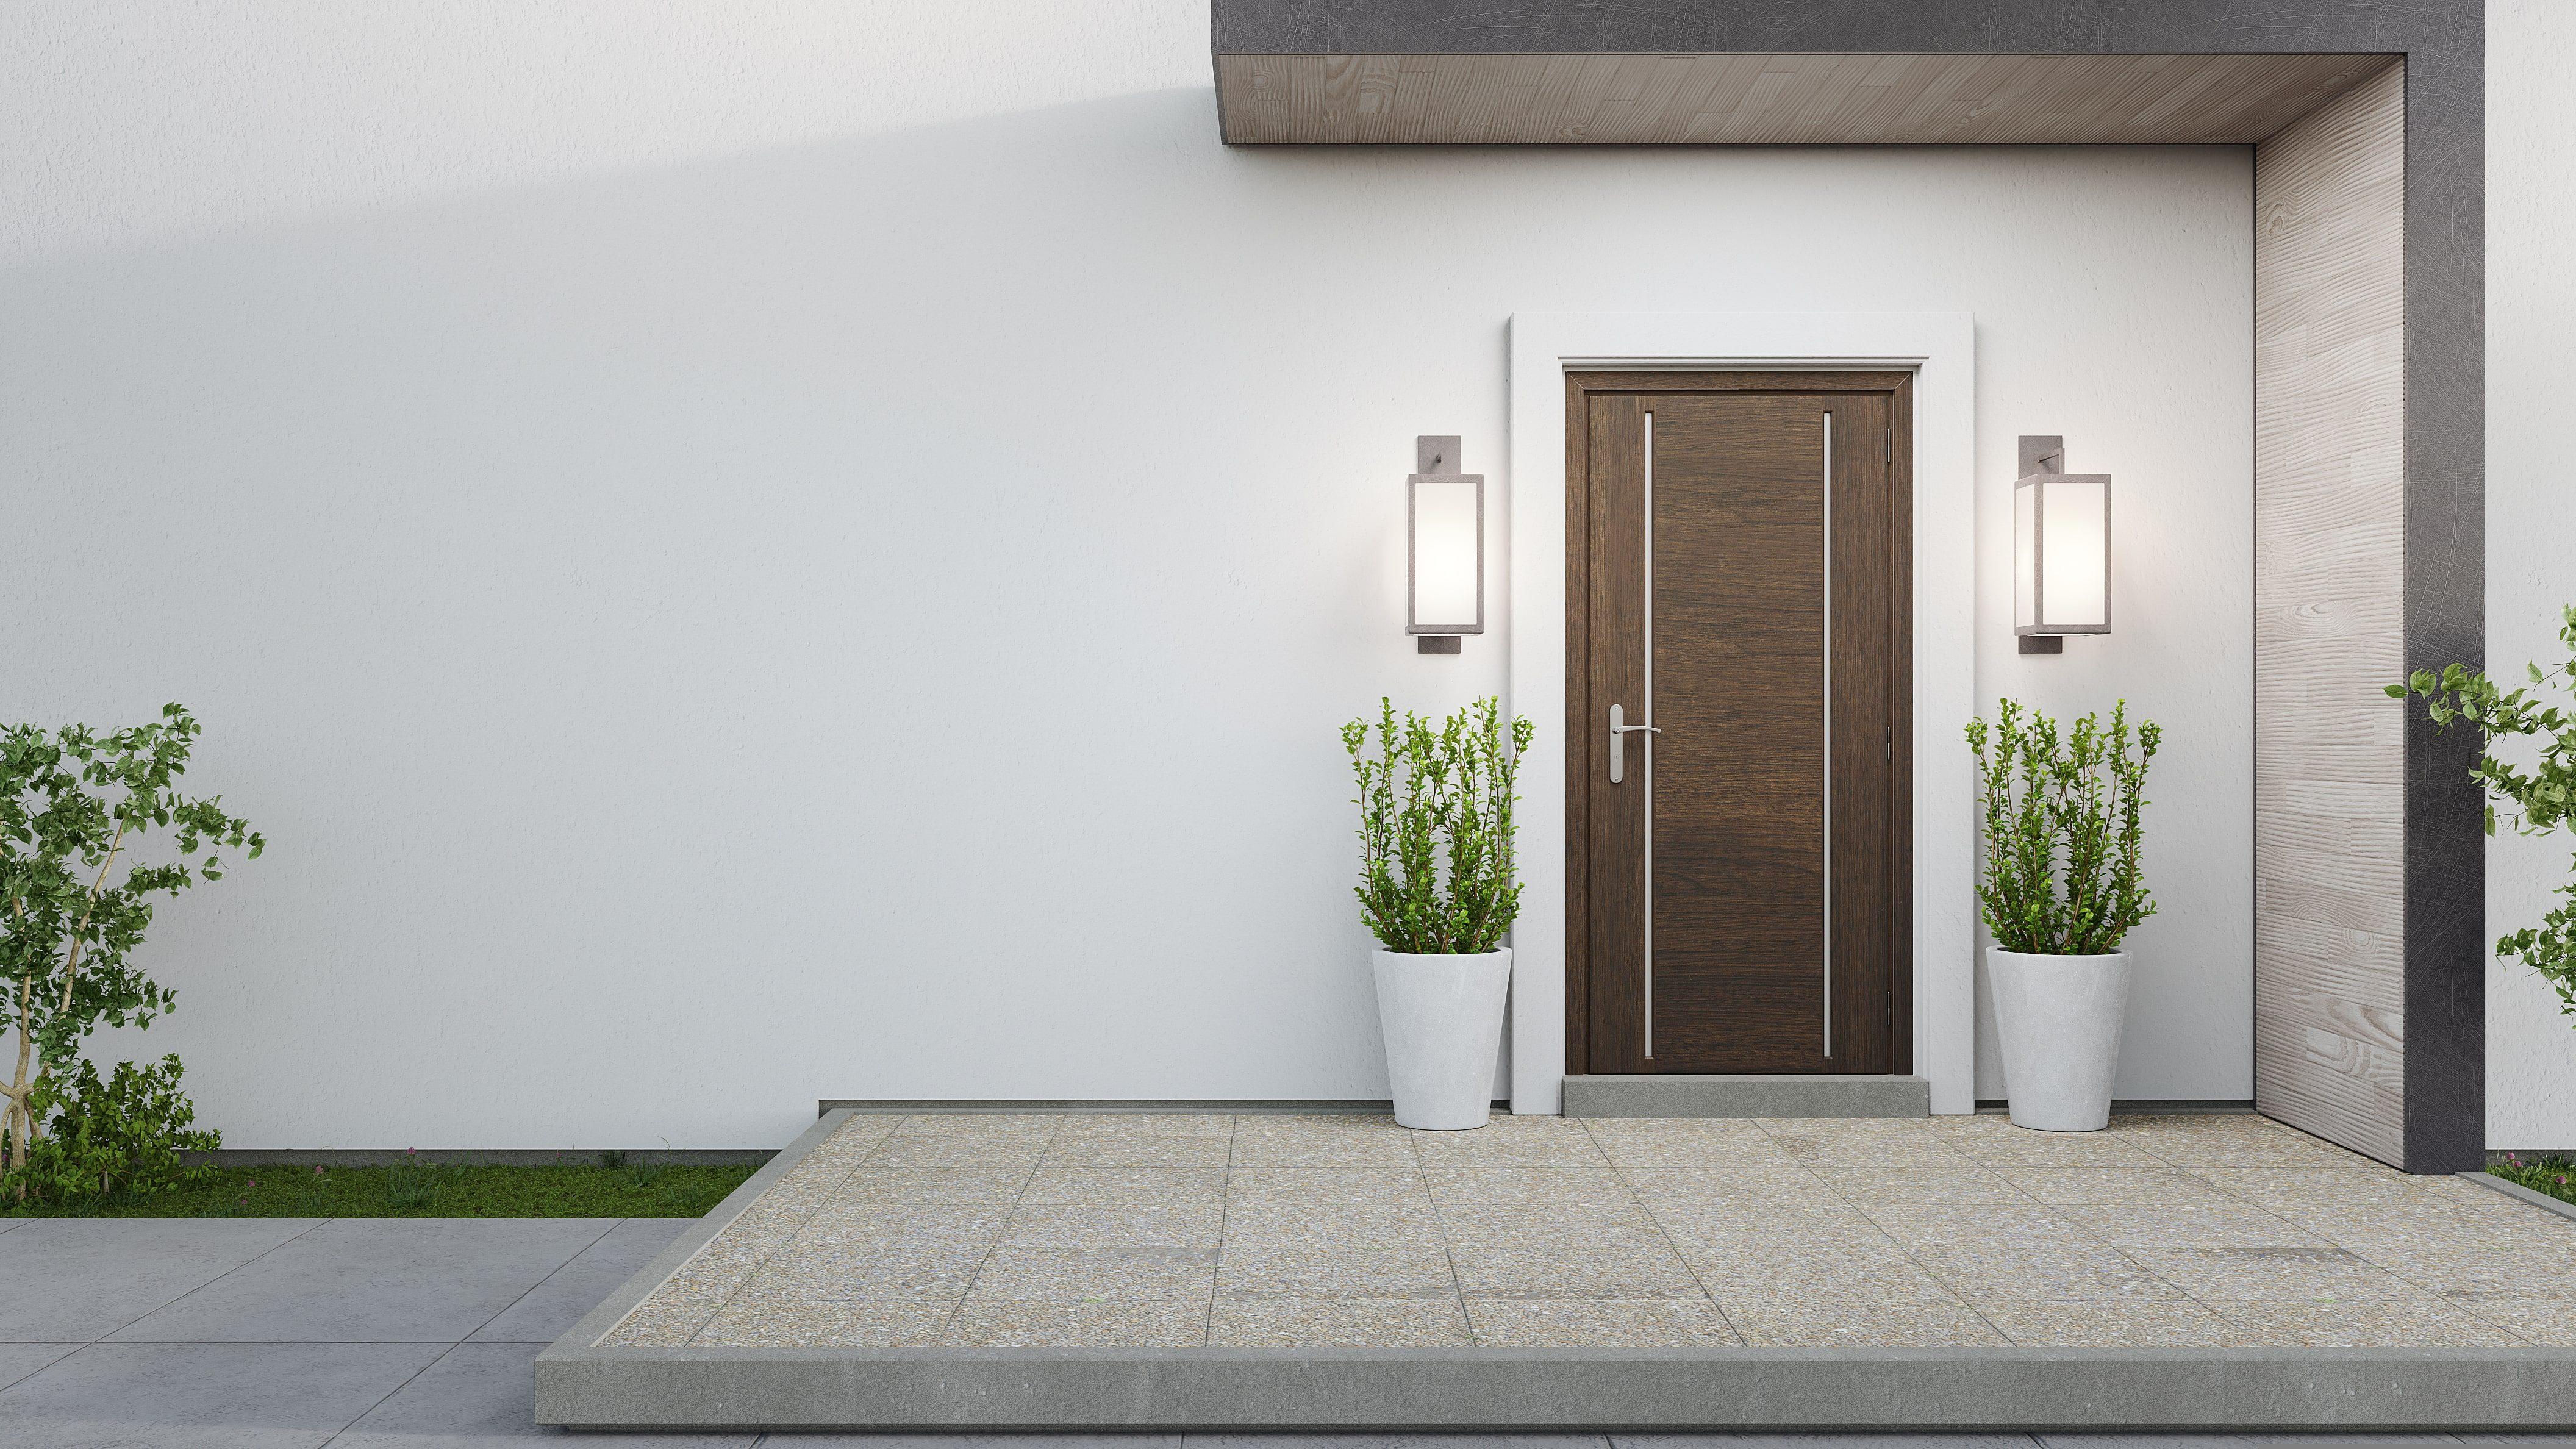 Moderné vchodové drevené dvere